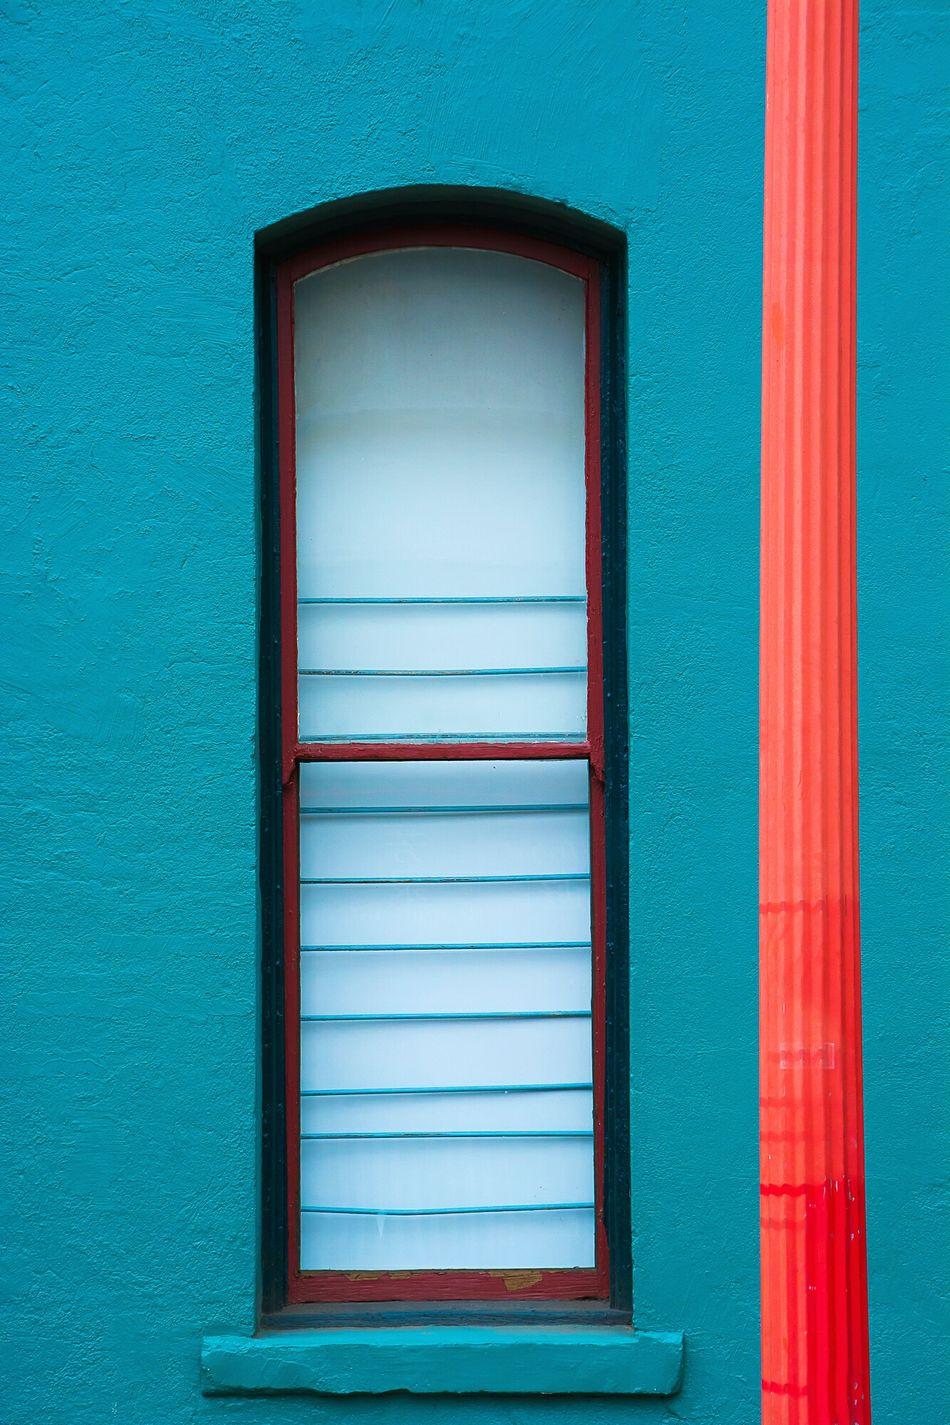 Urban Design, Geometrical Shapes, Colorful Geometrical Shapes, Urban Art, Urban Geometry, Urban Art, Symmetry Art, Colorful Geometry, Colorful Background, Colorful Shapes The Architect - 2016 EyeEm Awards Fine Art Photography Minimalist Architecture Art Is Everywhere